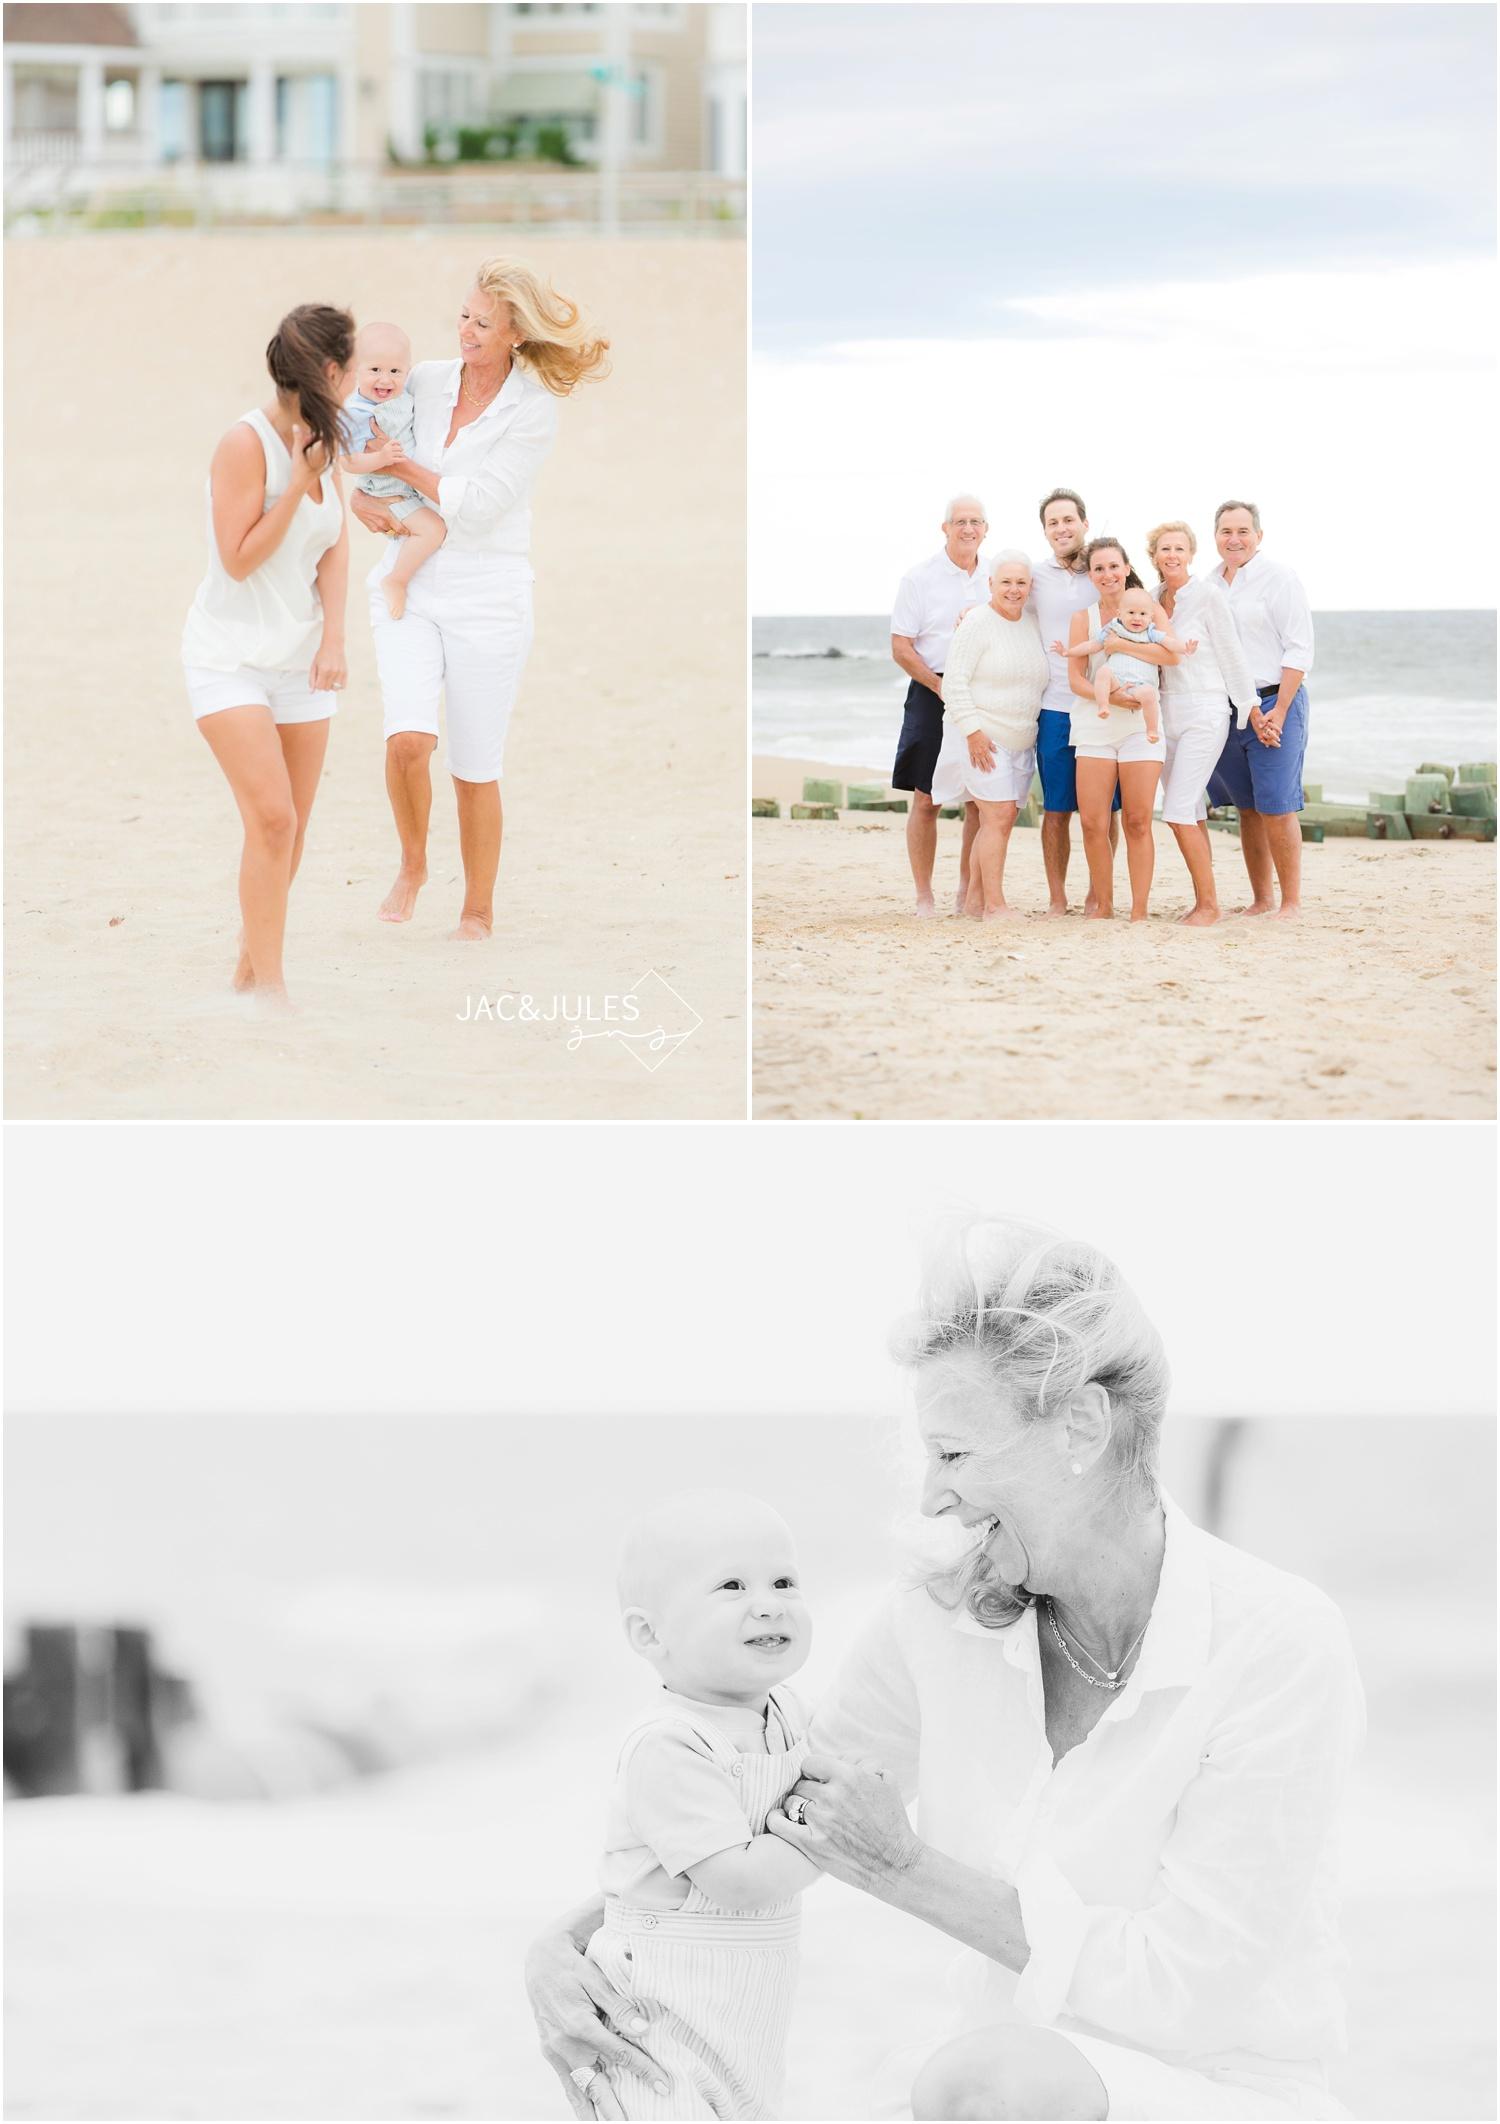 Family photos with grandparents on the beach in Sea Girt, NJ.